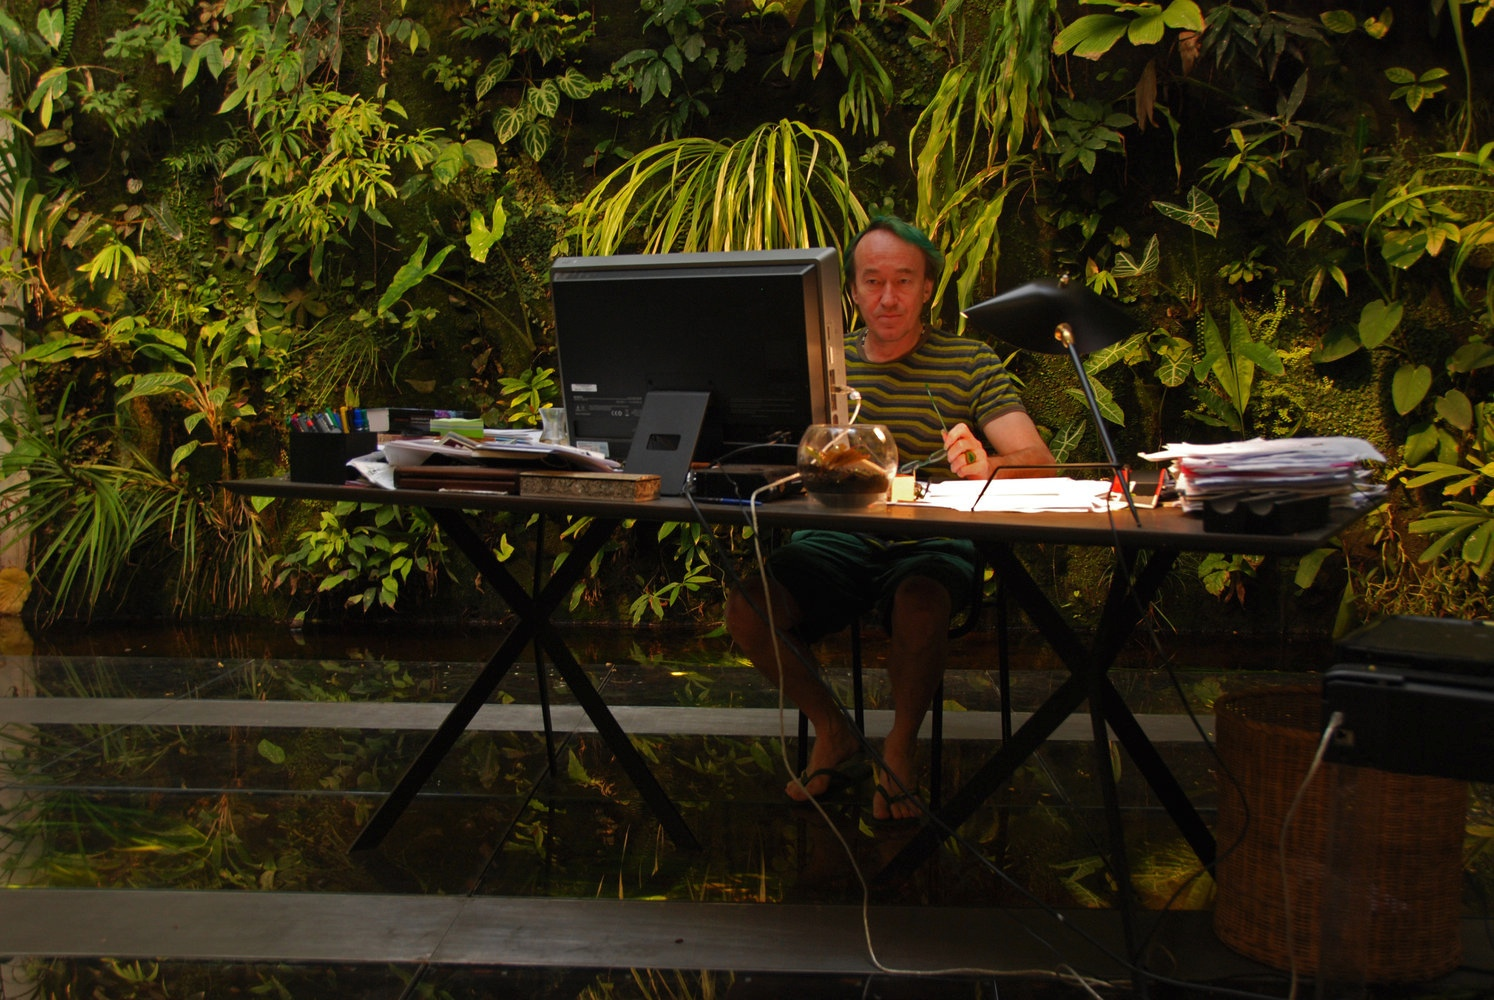 Patrick-Blanc-Interior-workspace-over-fresh-water-aquarium-surrounded-by-gardens-.jpeg